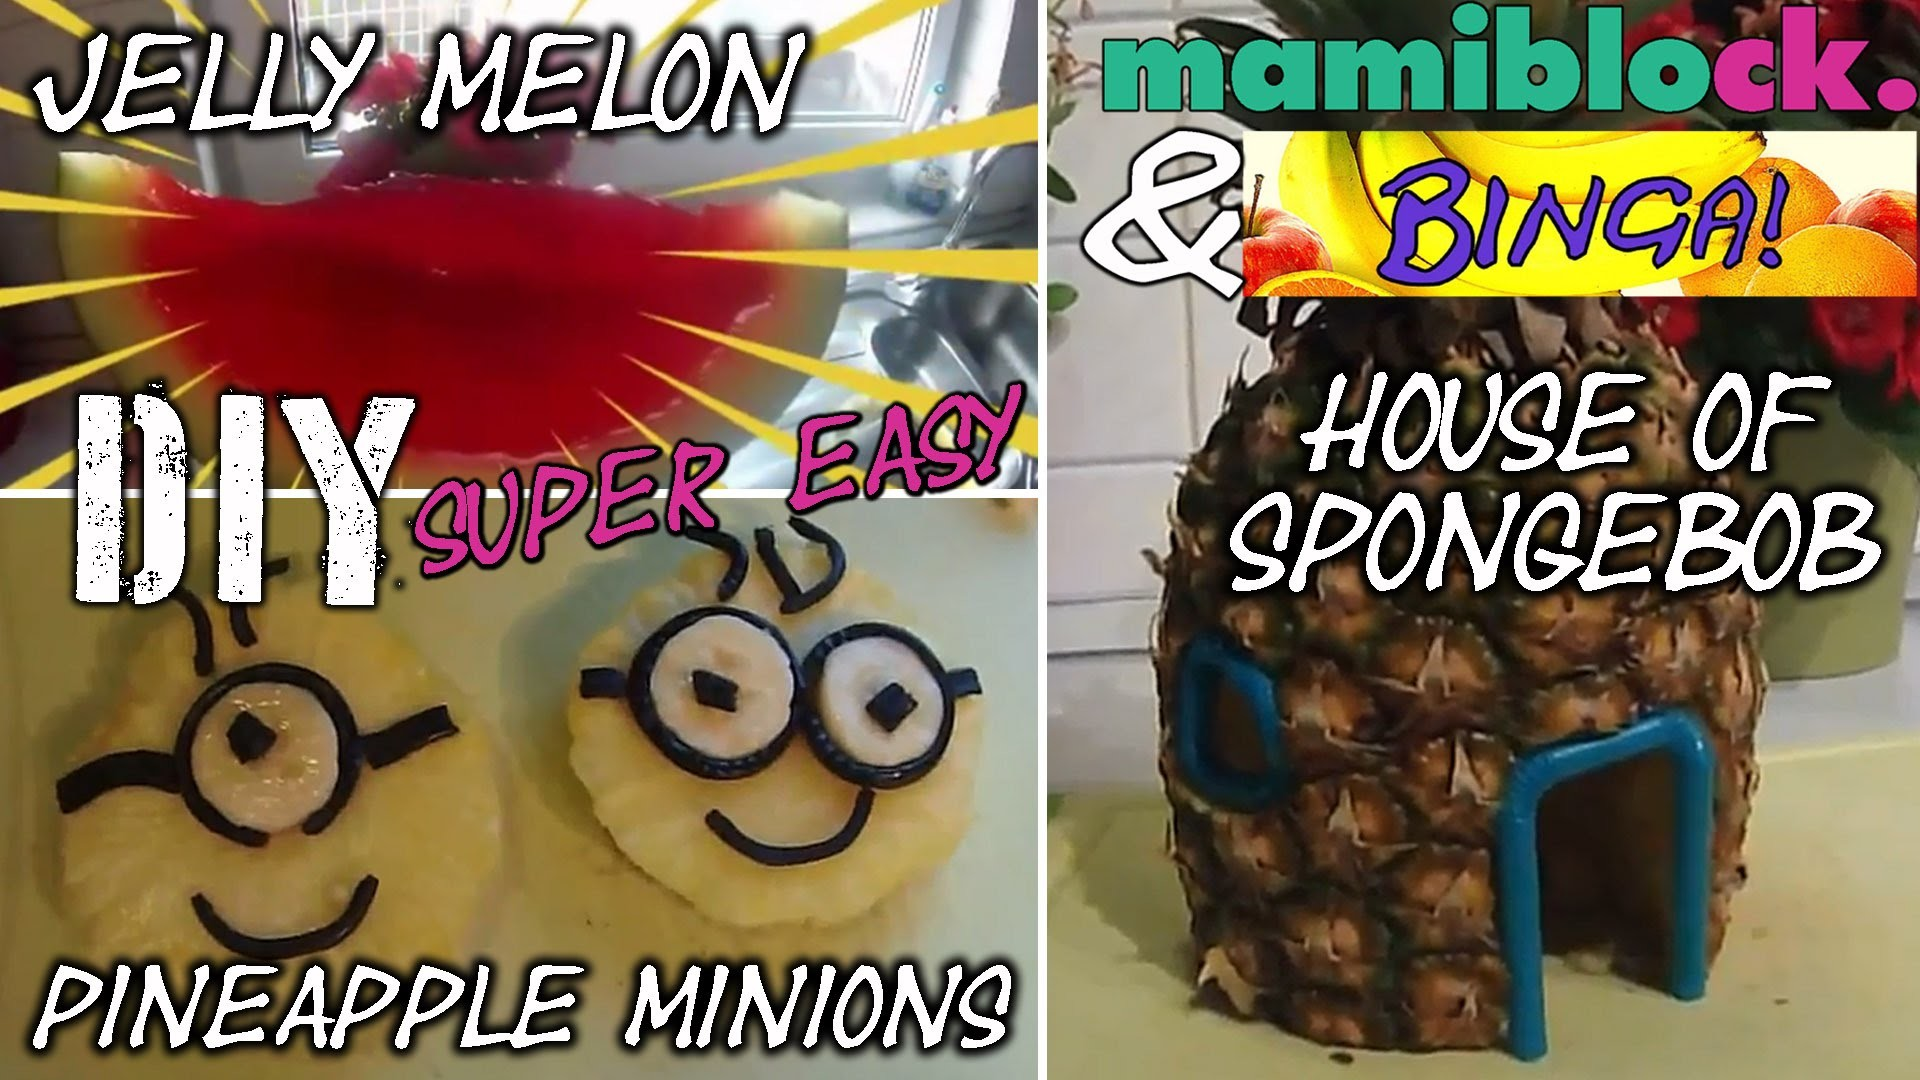 DIY Ananas Minions   House of Spongebob   Jelly Watermelon   Fruit Carving   mamiblock & BINGA